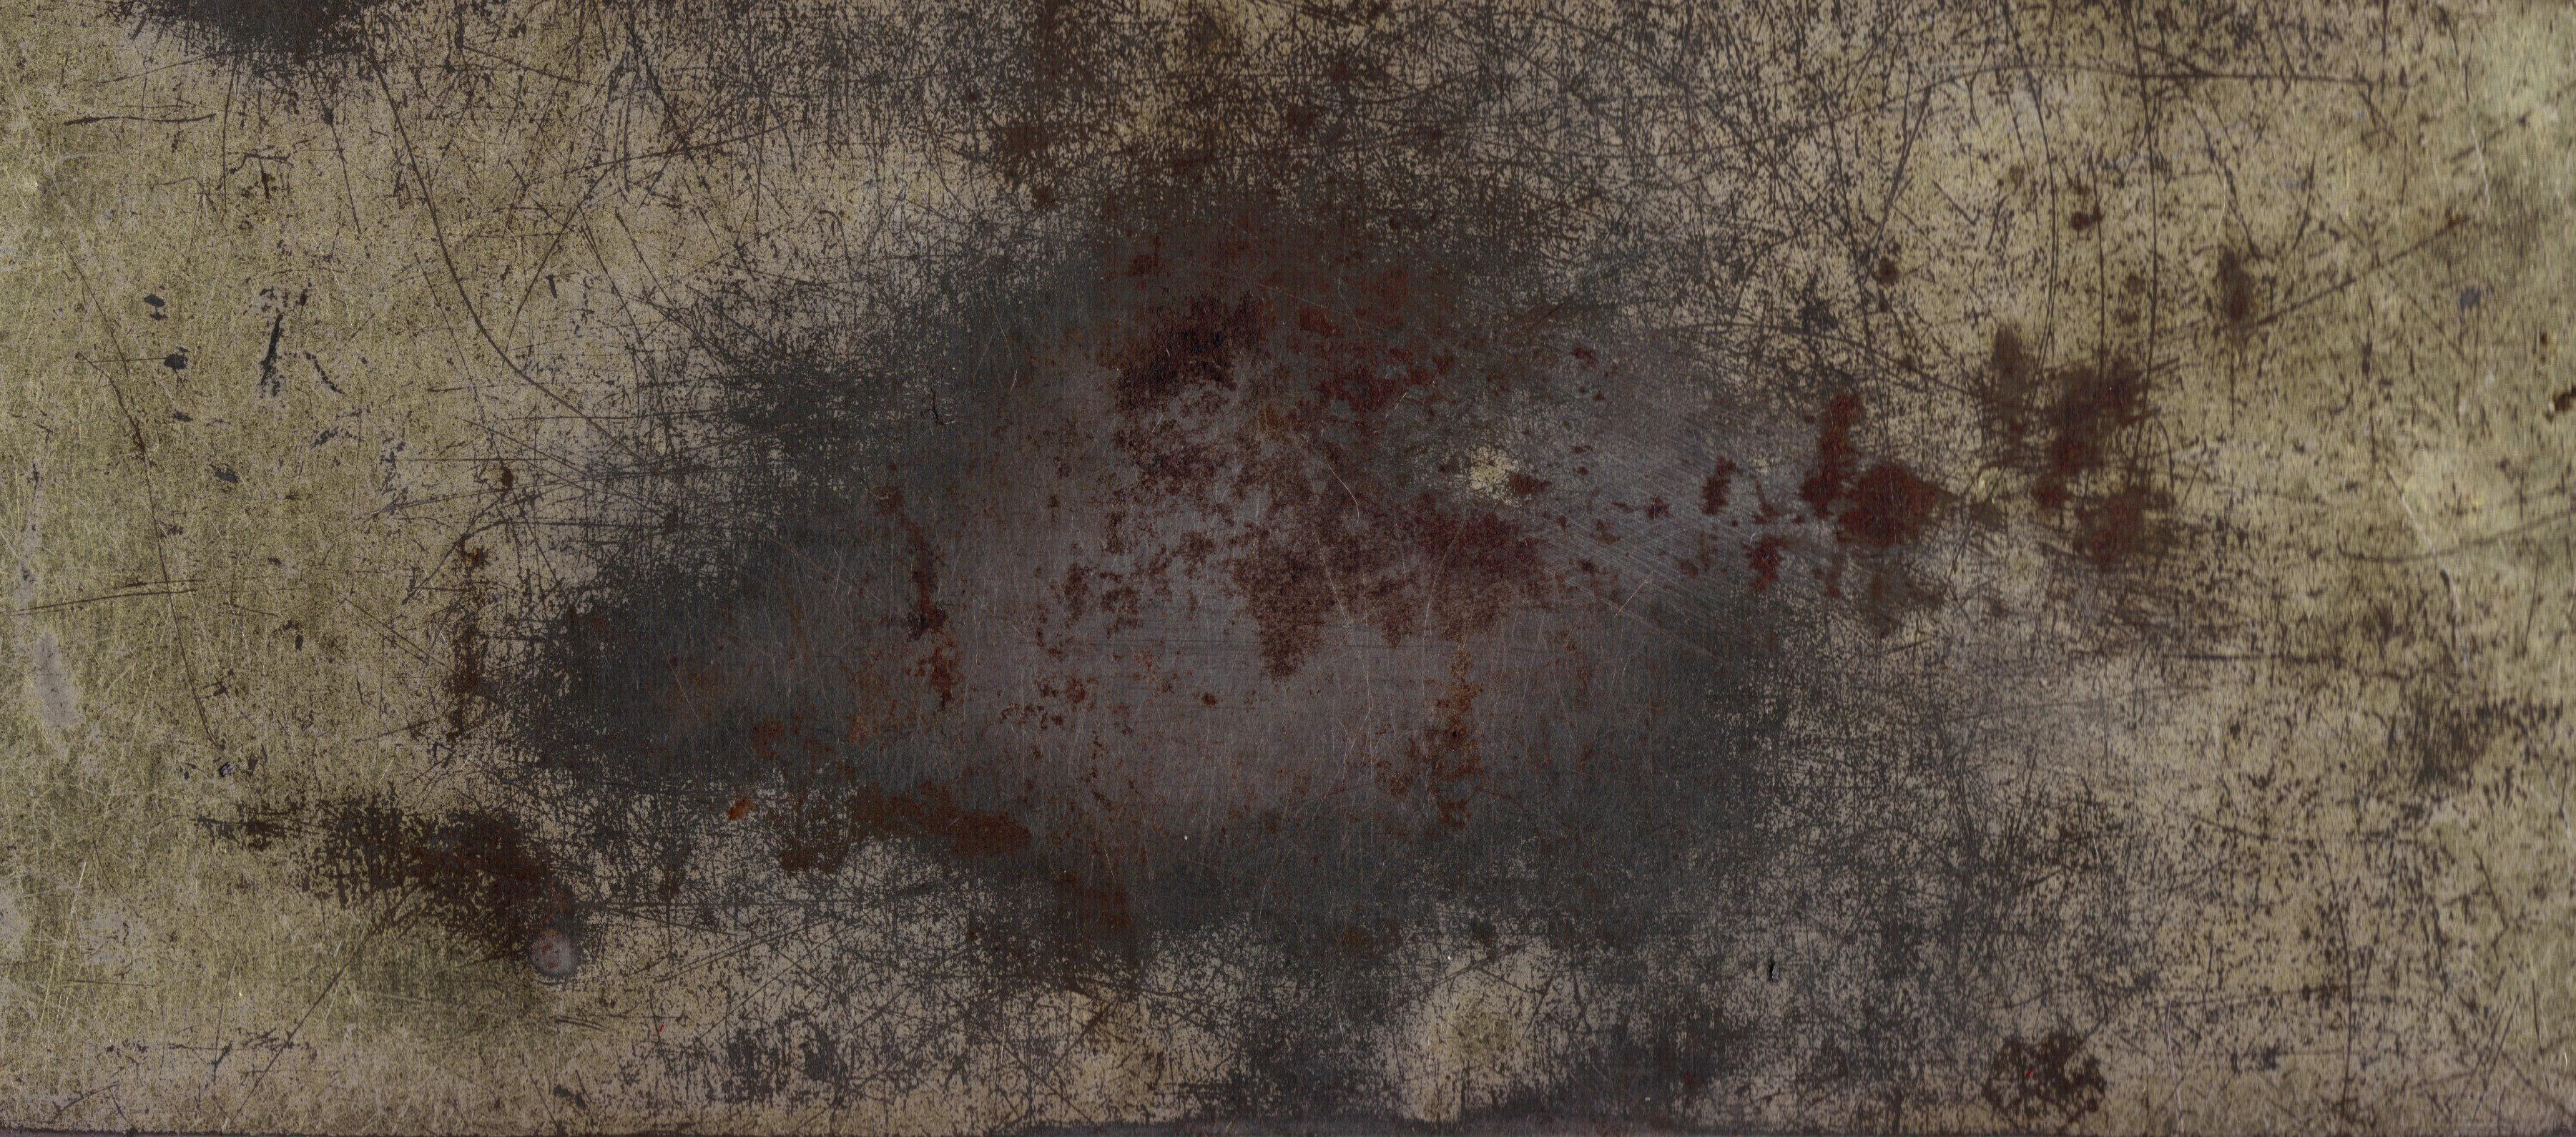 Rusty Metal Plate Texture Jpg Onlygfx Com